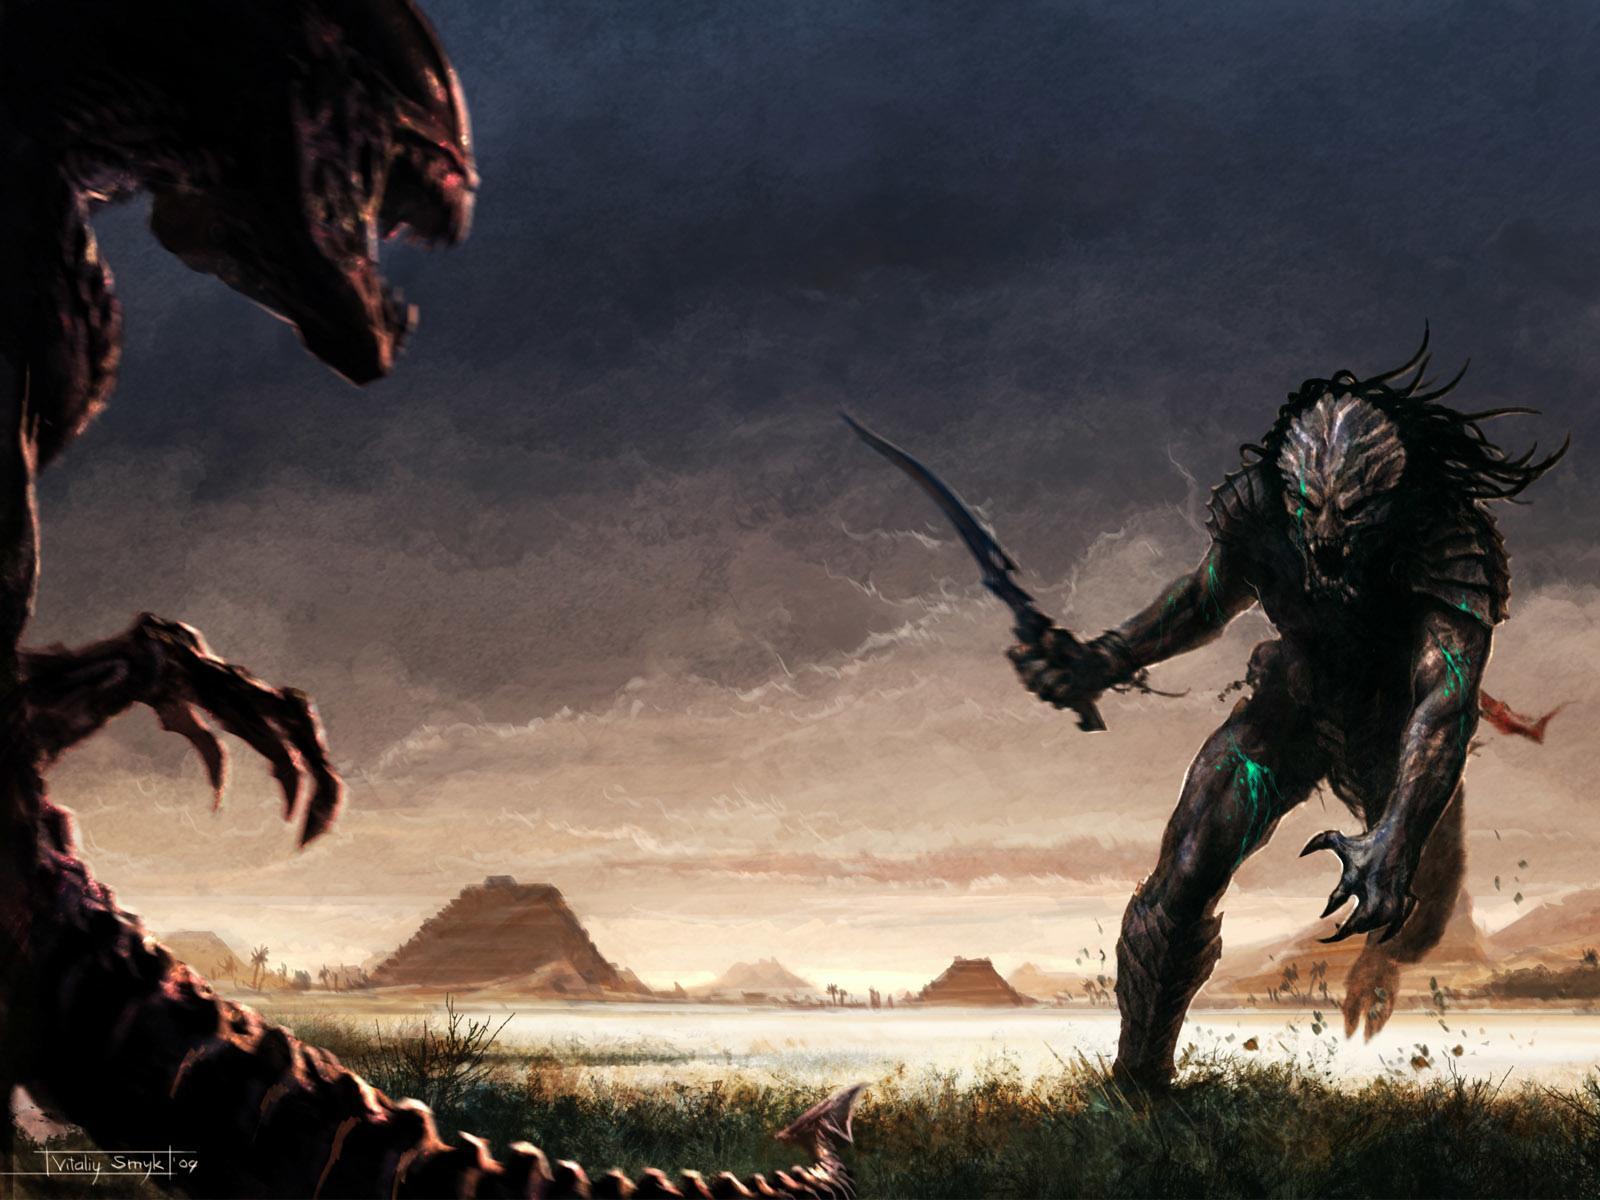 Alien Vs Predator Hd Wallpapers: Alien Vs. Predator Wallpaper HD Download